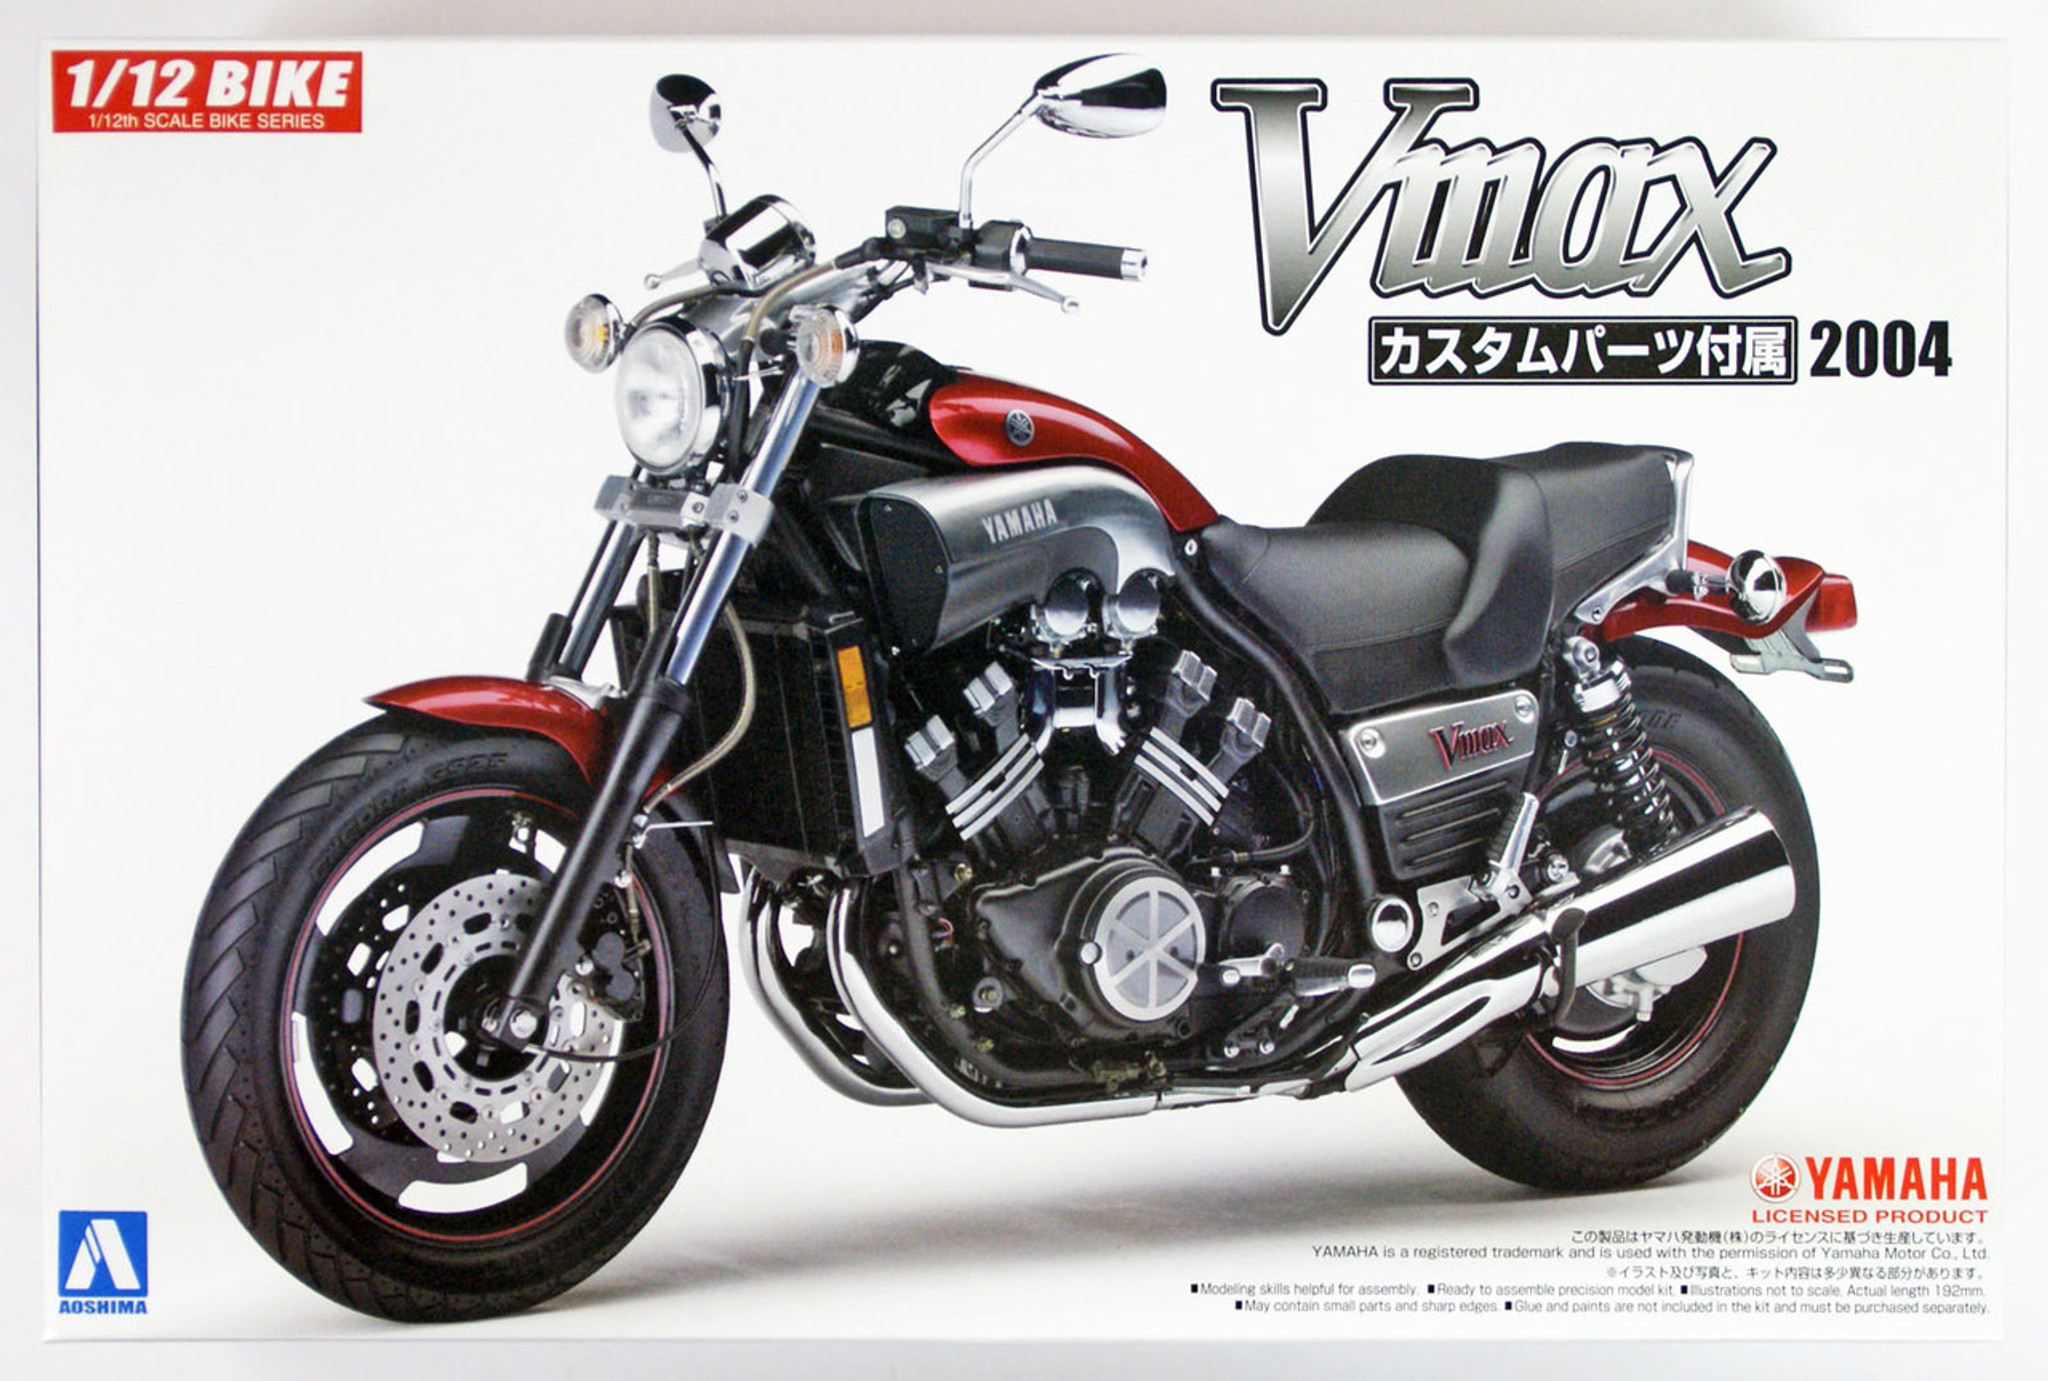 Aoshima 54307 Bike 47 YAMAHA Vmax with CUSTOM PARTS 1/12 Scale Kit